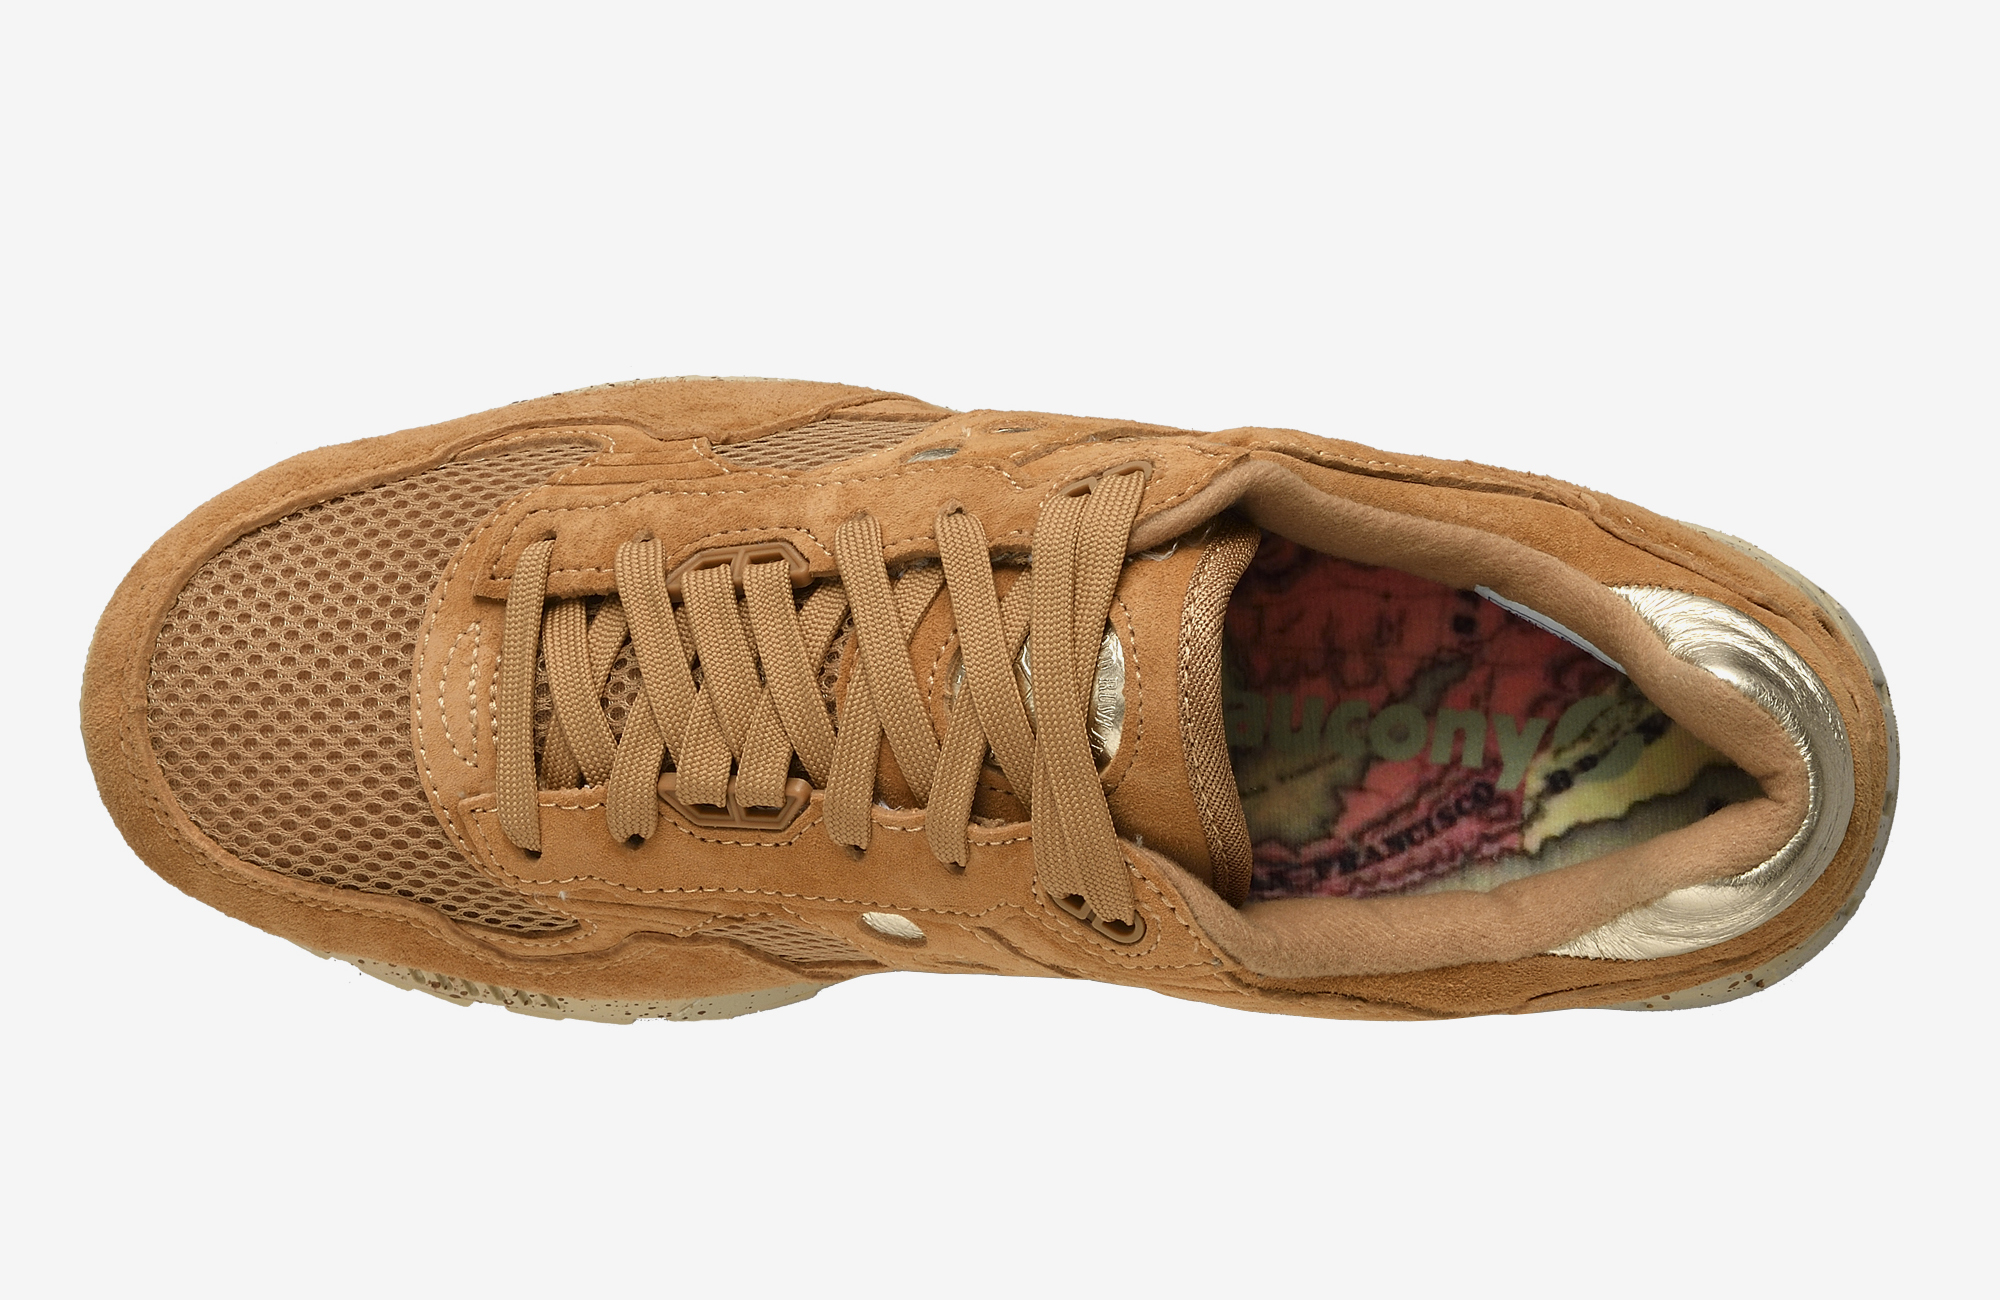 sports shoes 1232b 09d32 Speciale: Saucony Originals Shadow 5000 'Gold Rush' - UNOTRE